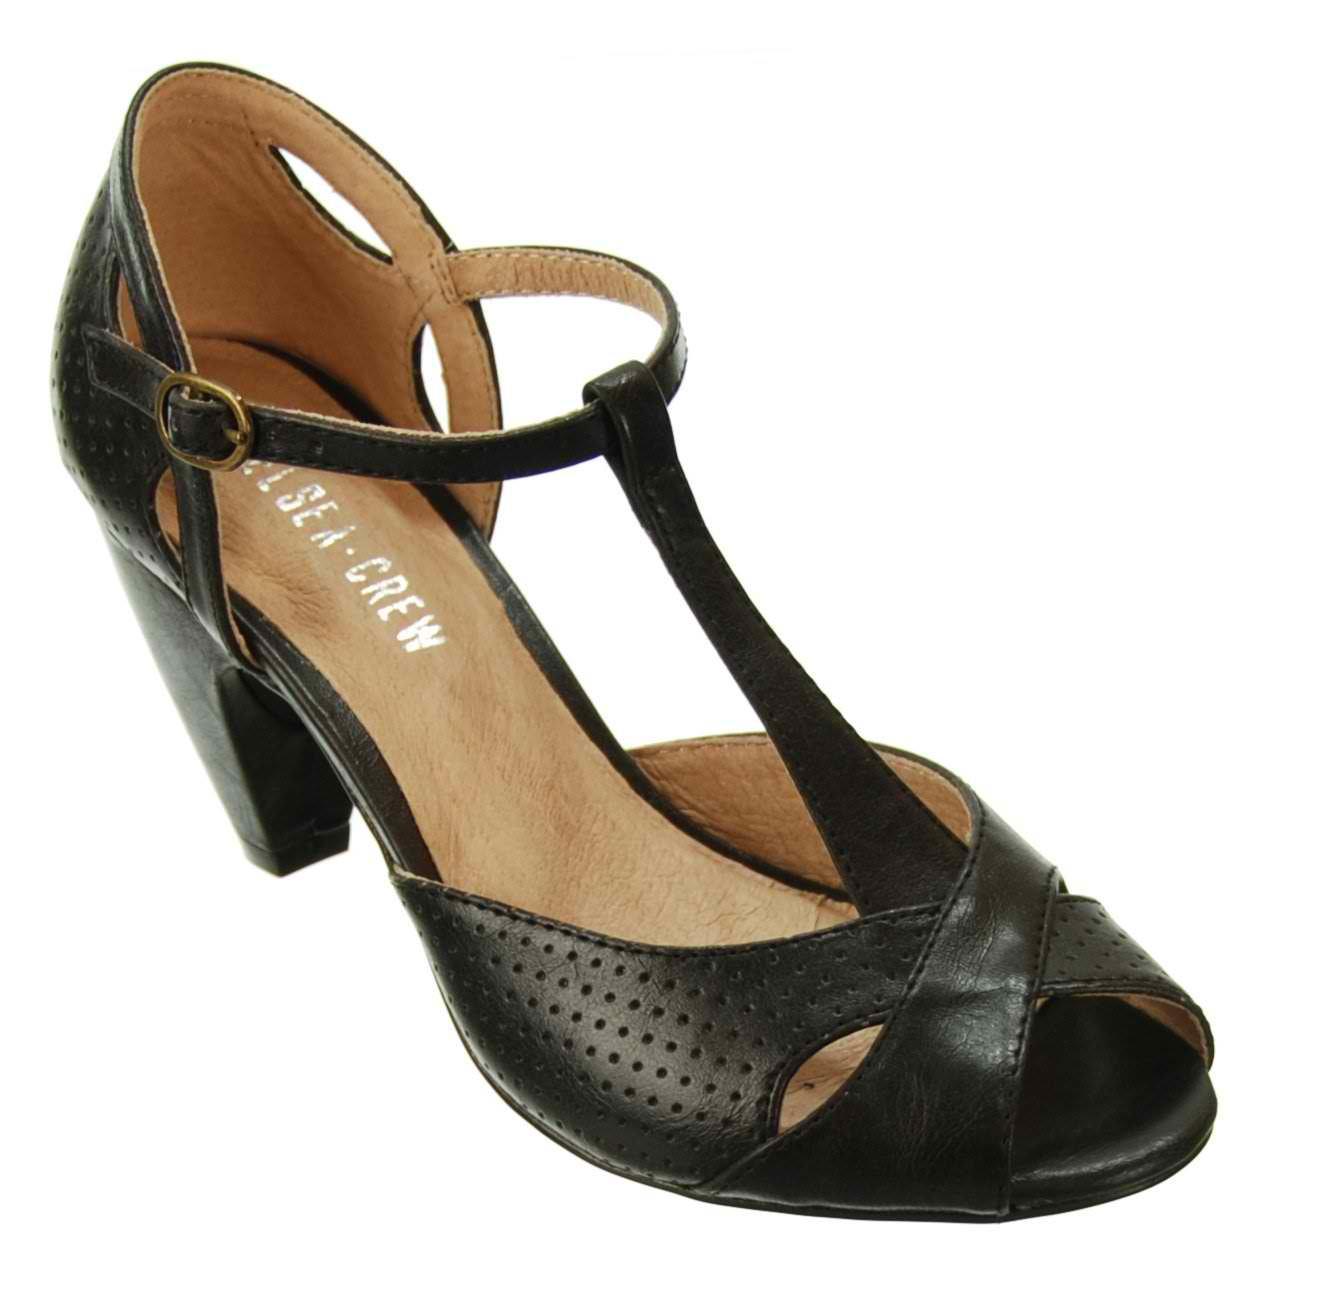 Modest Shoes: Chelsea Crew - MoMoMod - Modest Style Blog | Modest